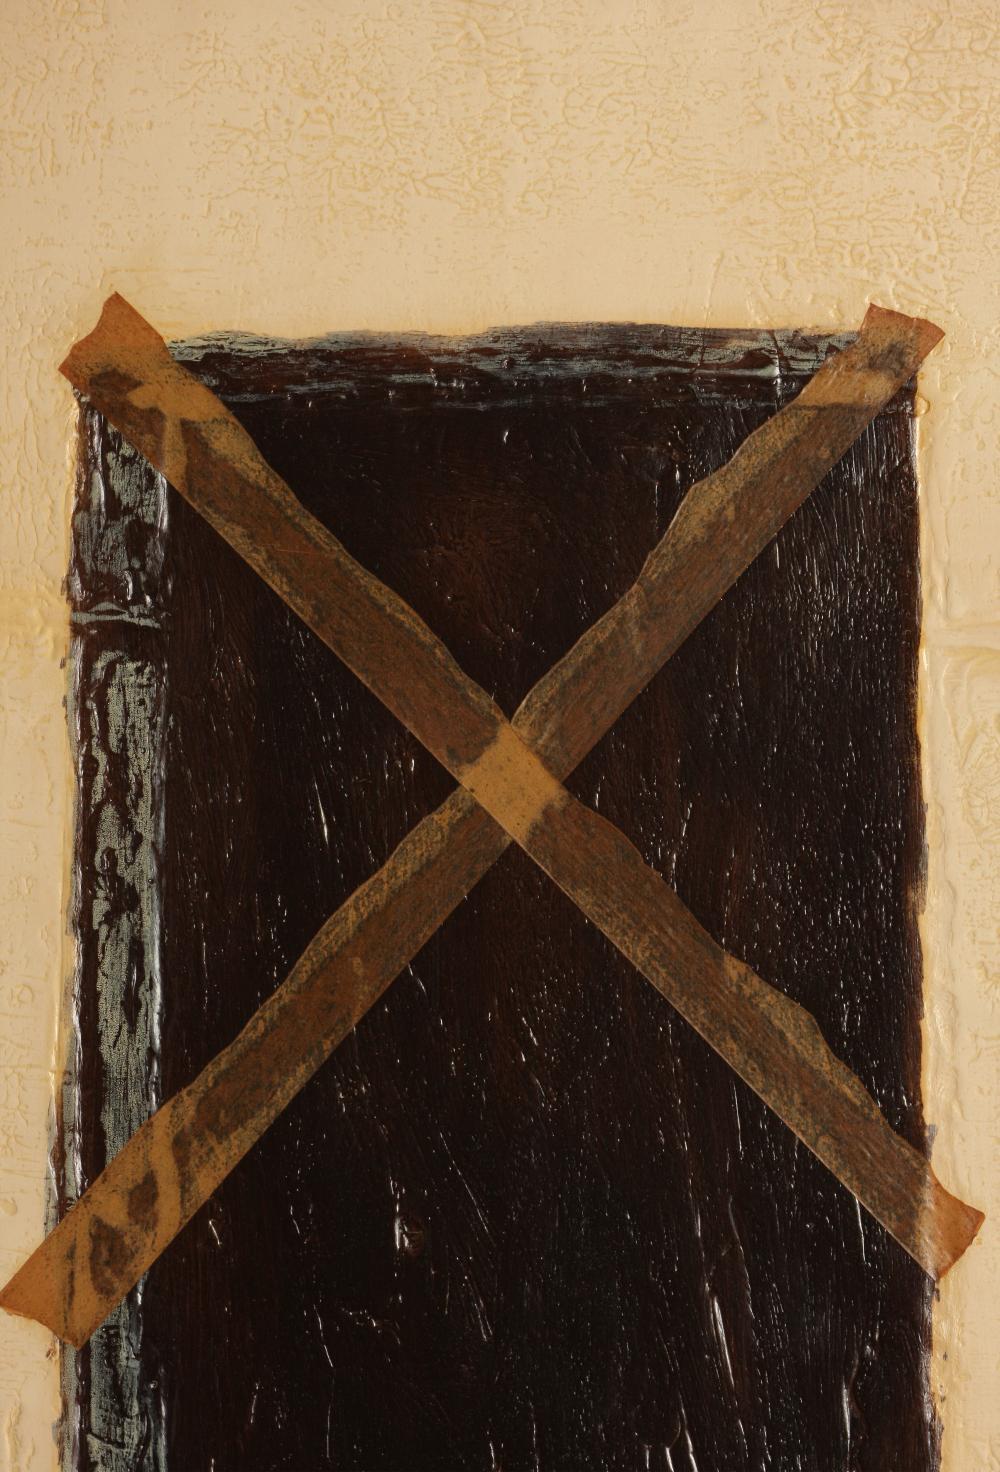 Antoni Tàpies (Spain 1923-2012) La Grande Porte (The Great Door), 1972